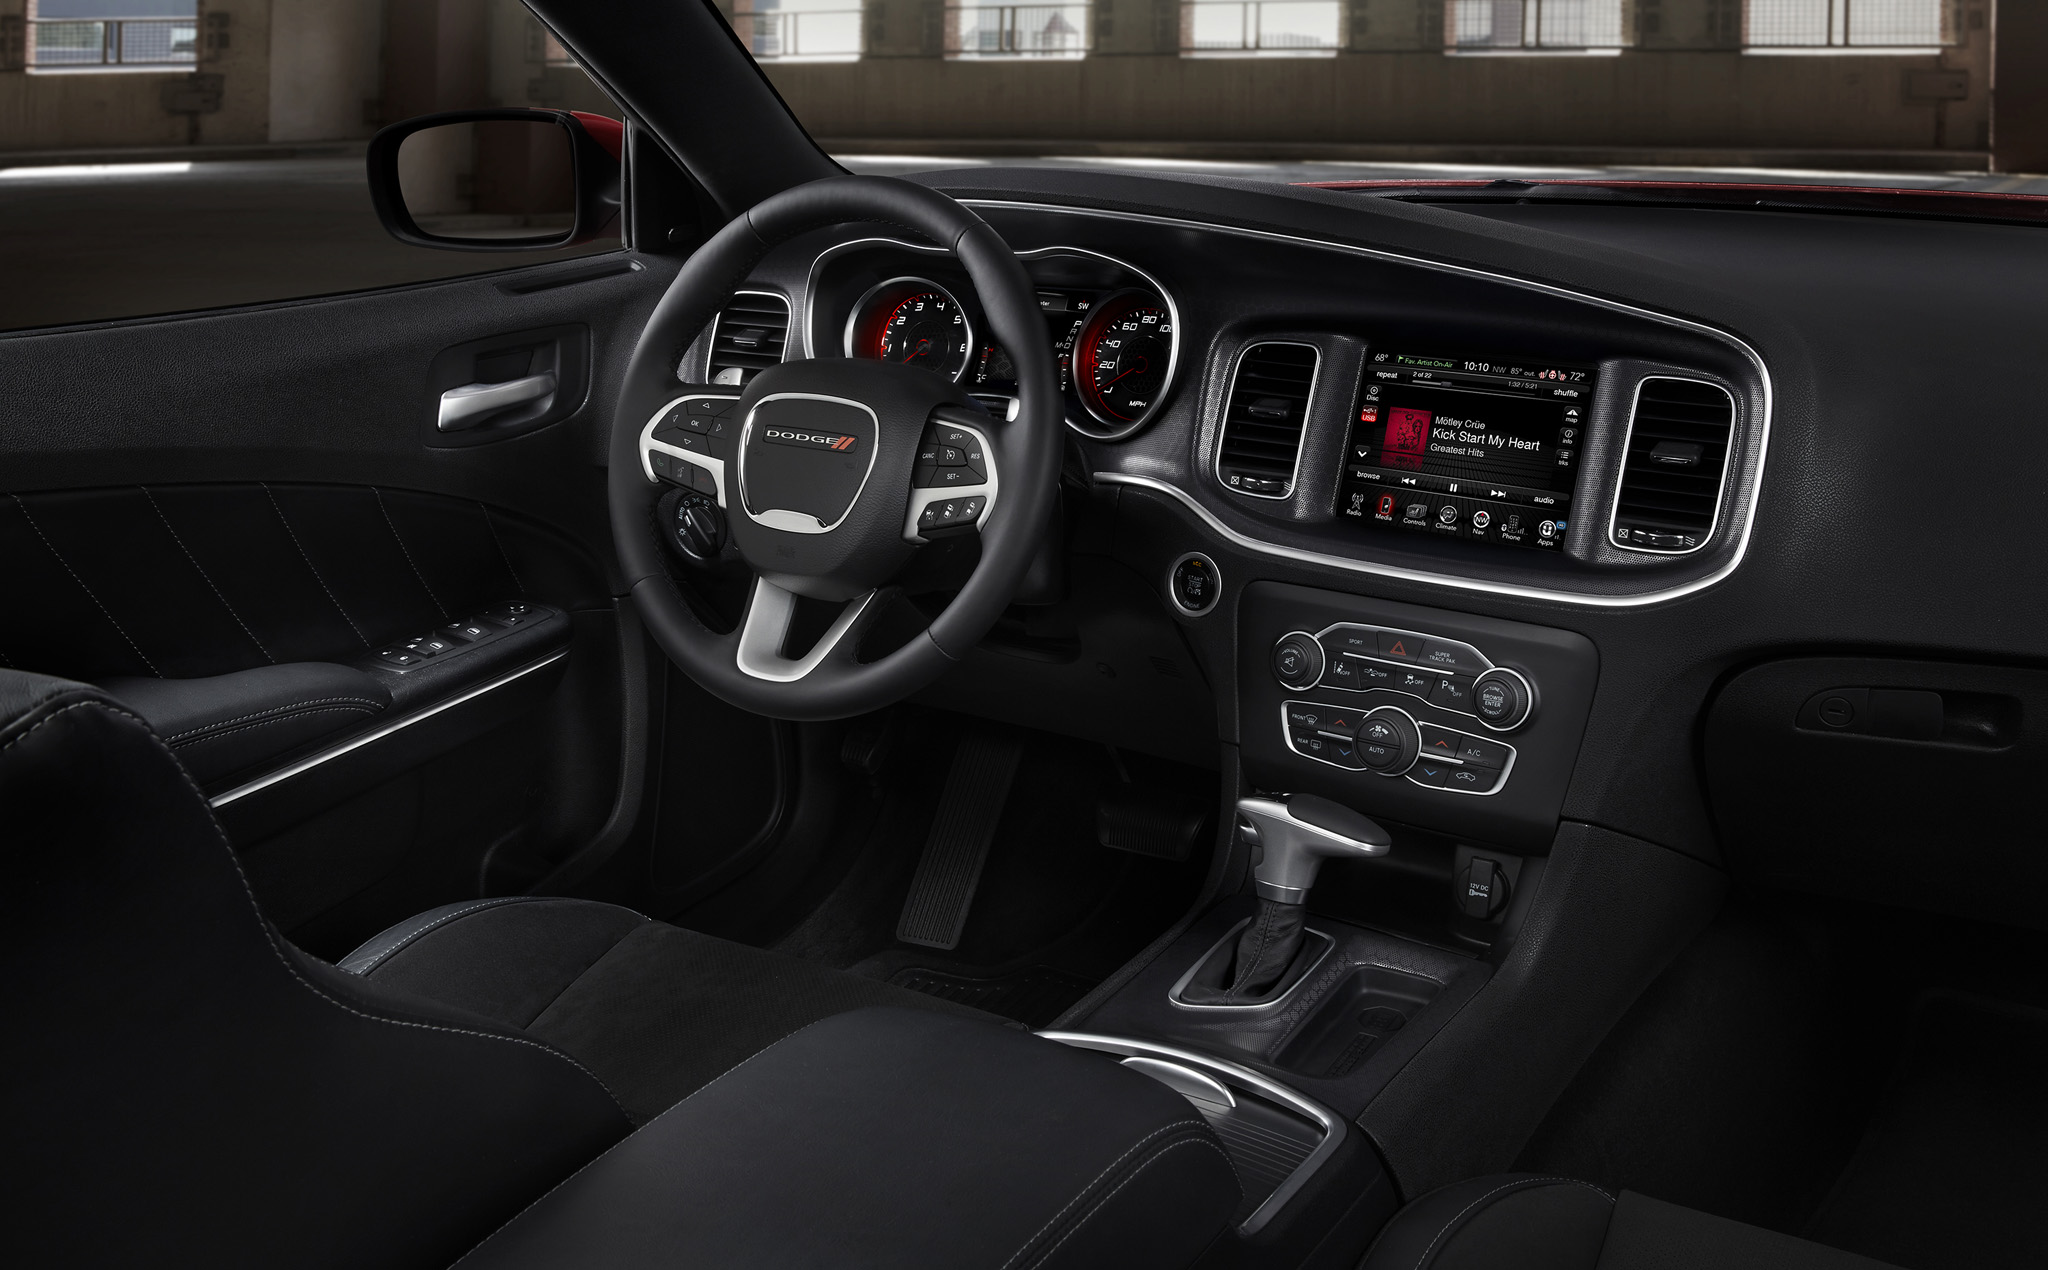 2015 Dodge Charger Front Interior Details